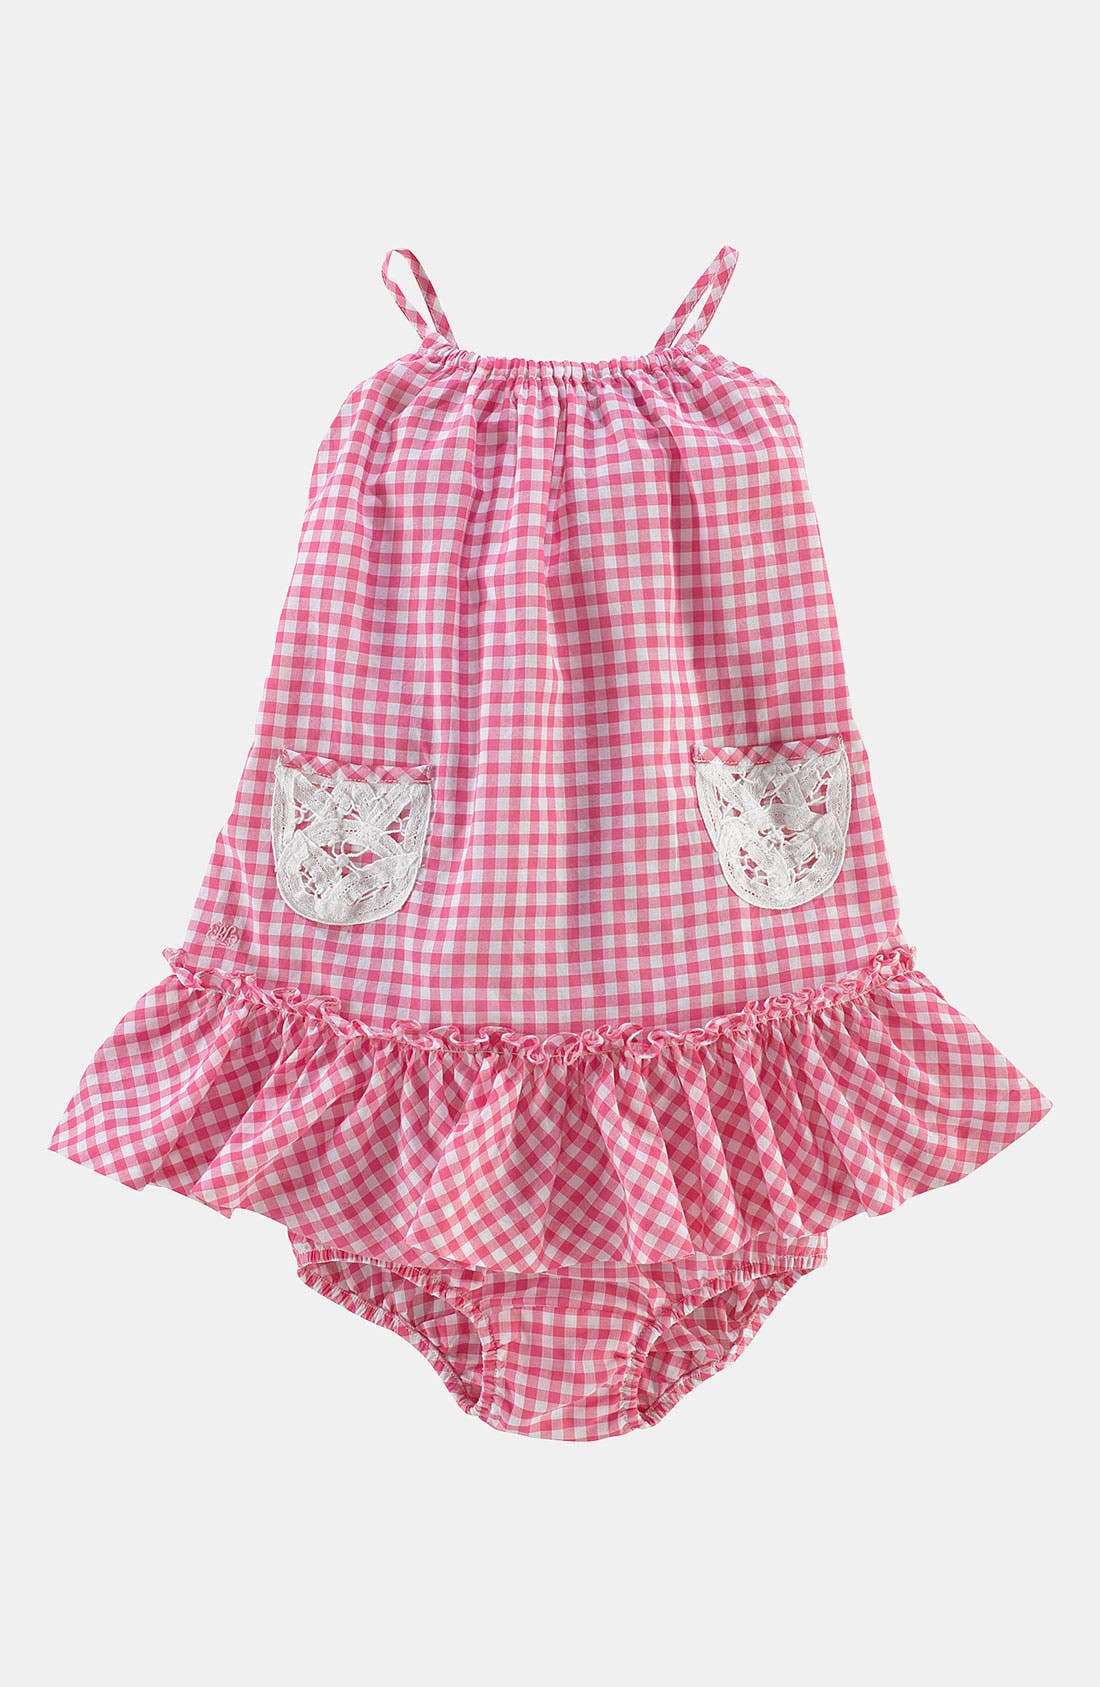 Alternate Image 1 Selected - Ralph Lauren Gingham Dress & Bloomers (Infant)